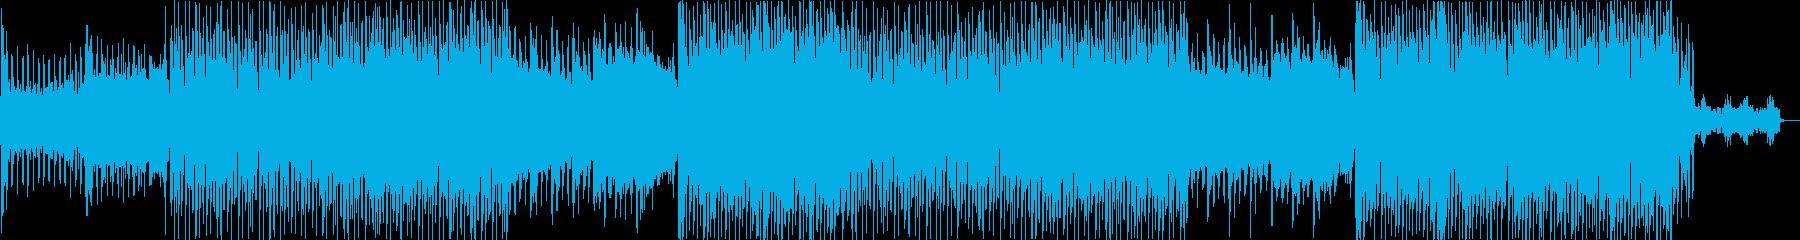 K-POP・激しいダークなレゲトンEDMの再生済みの波形